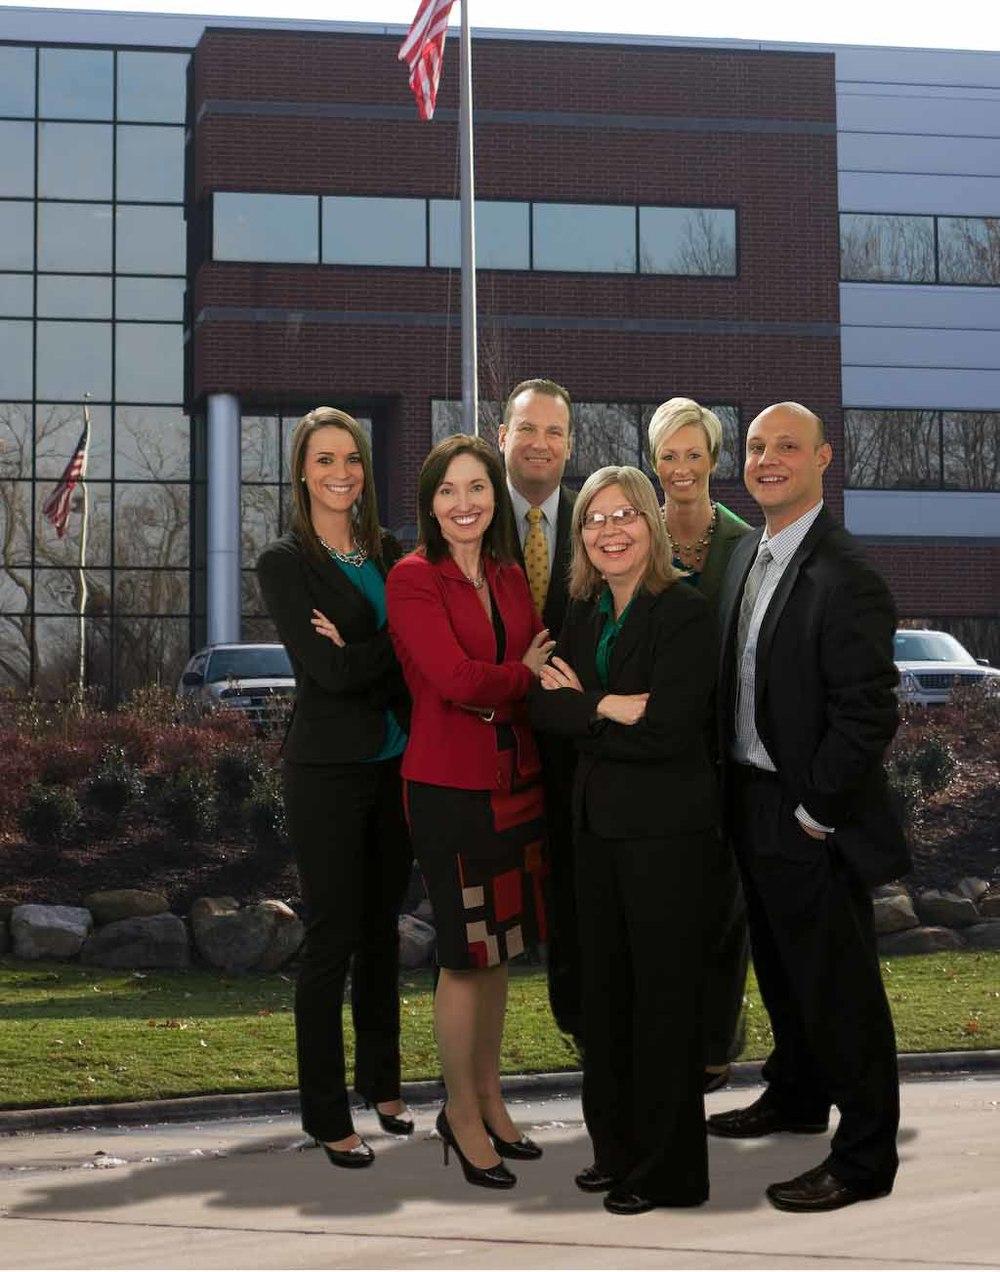 Cleveland Ohio Corporate Photography